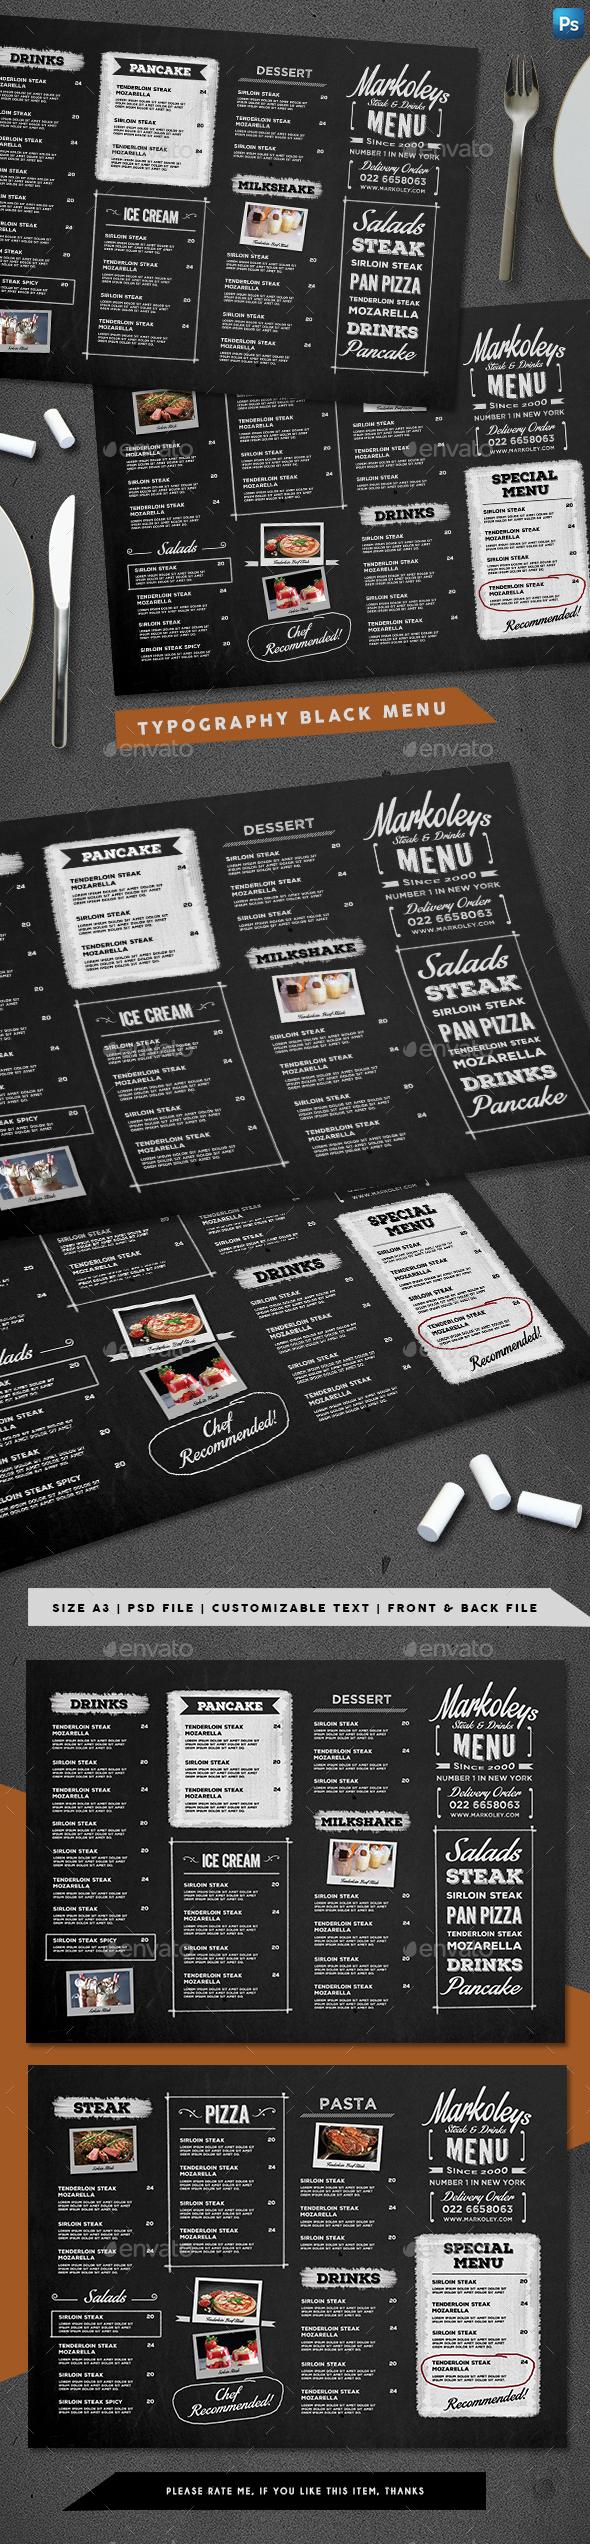 Typography Blackboard Menu - Food Menus Print Templates